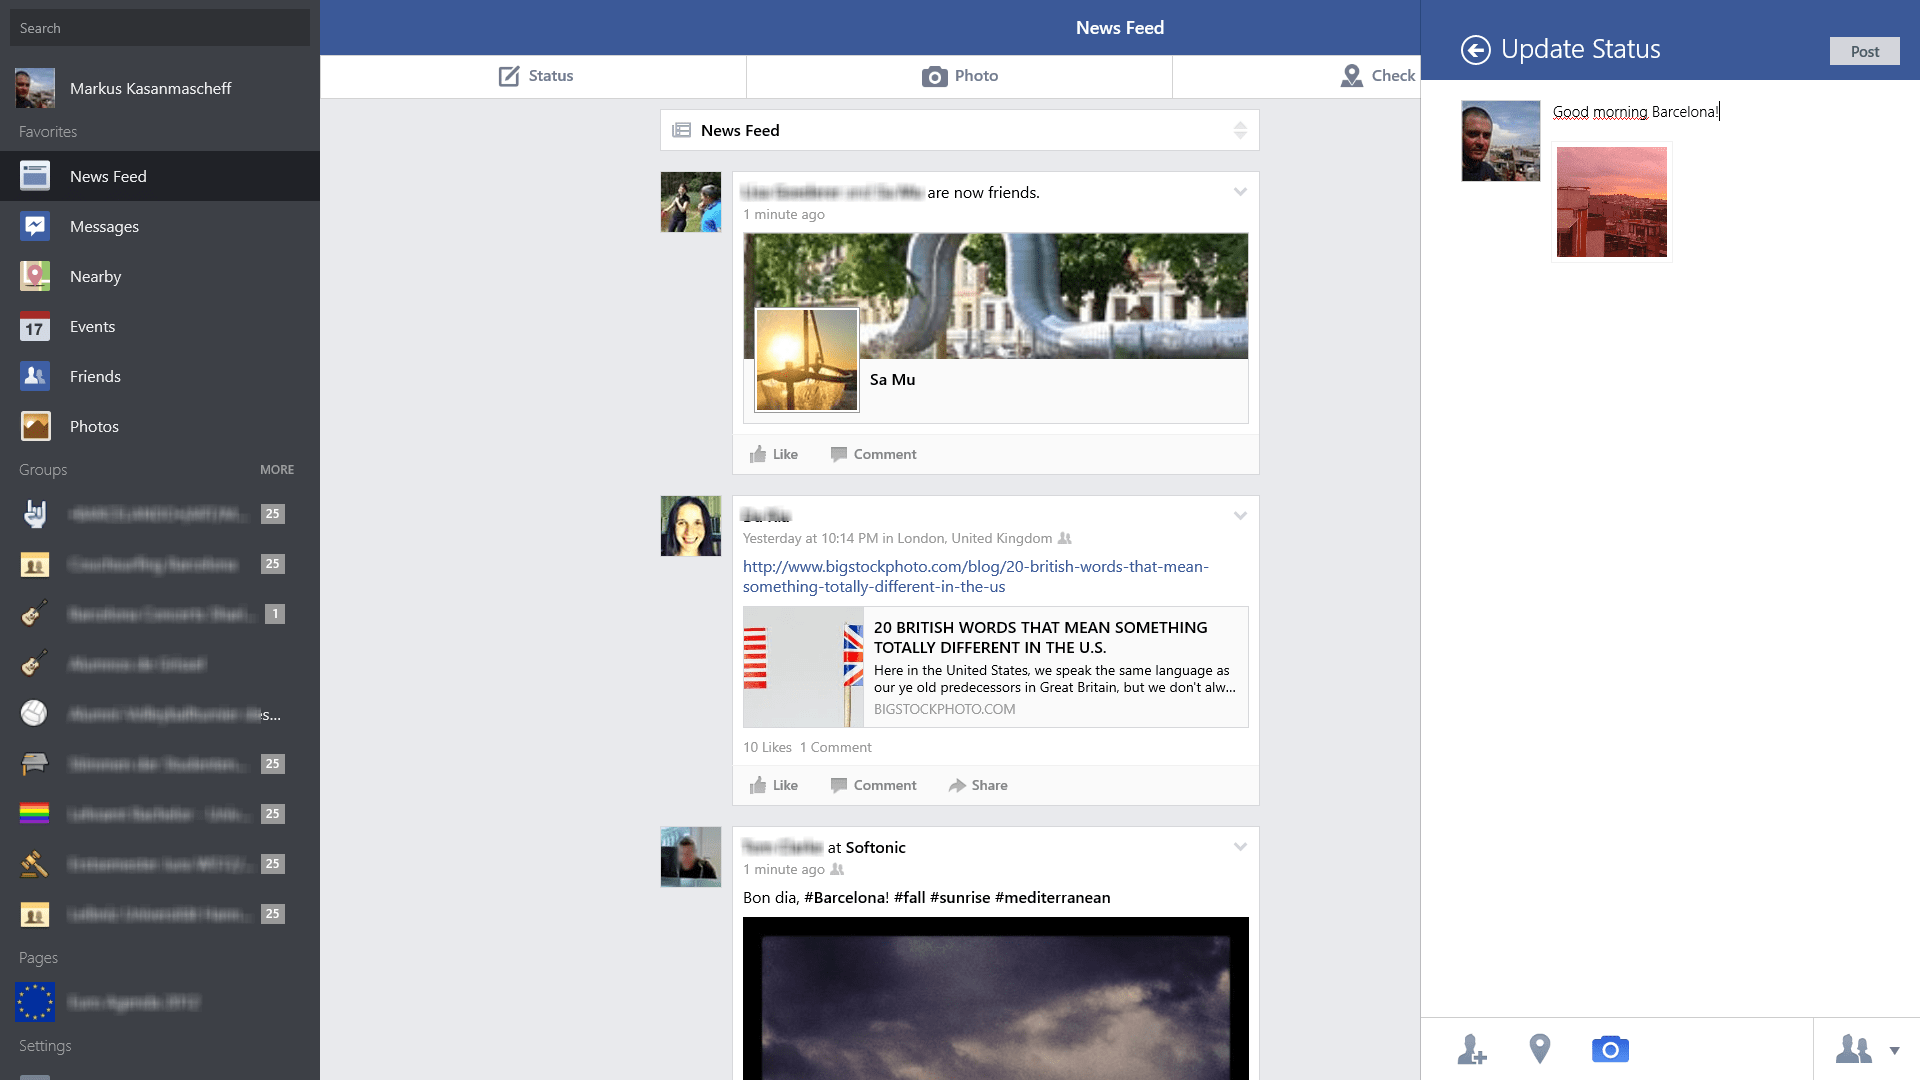 Télécharger <b>Facebook</b> Desktop <b>pour</b> <b>Windows</b> - clubic.com